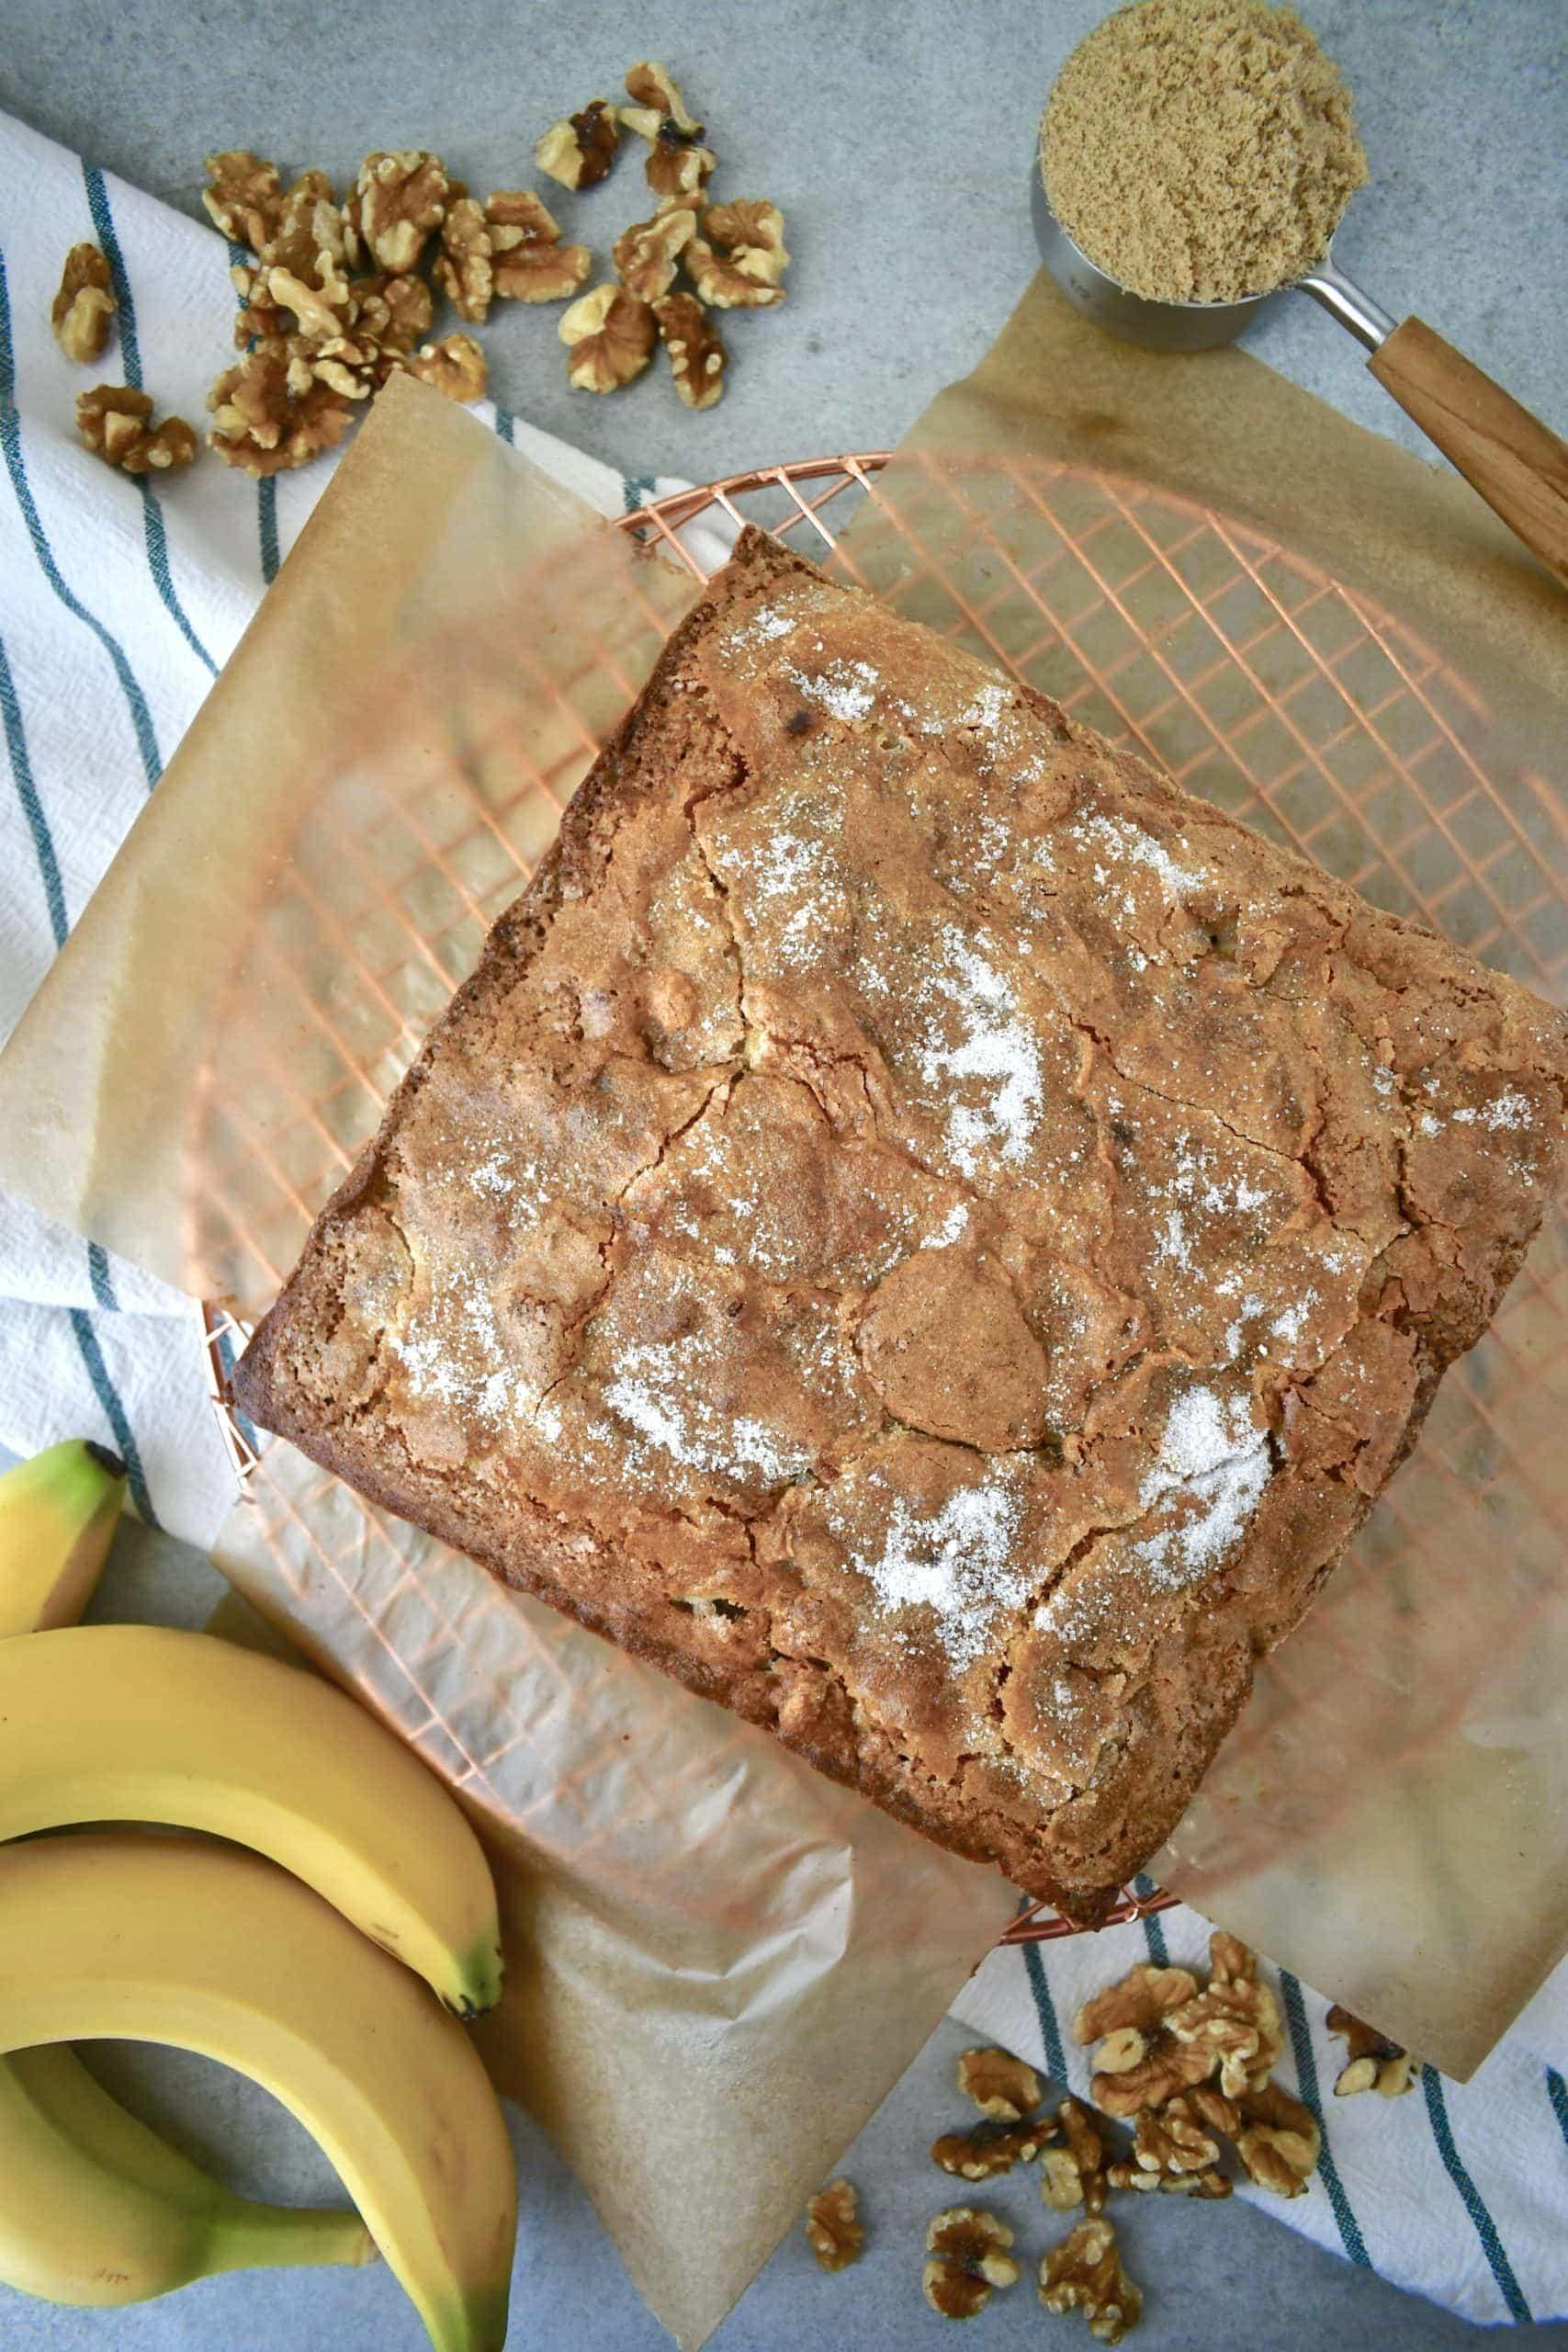 Joanna Gaines After-School Banana Bread